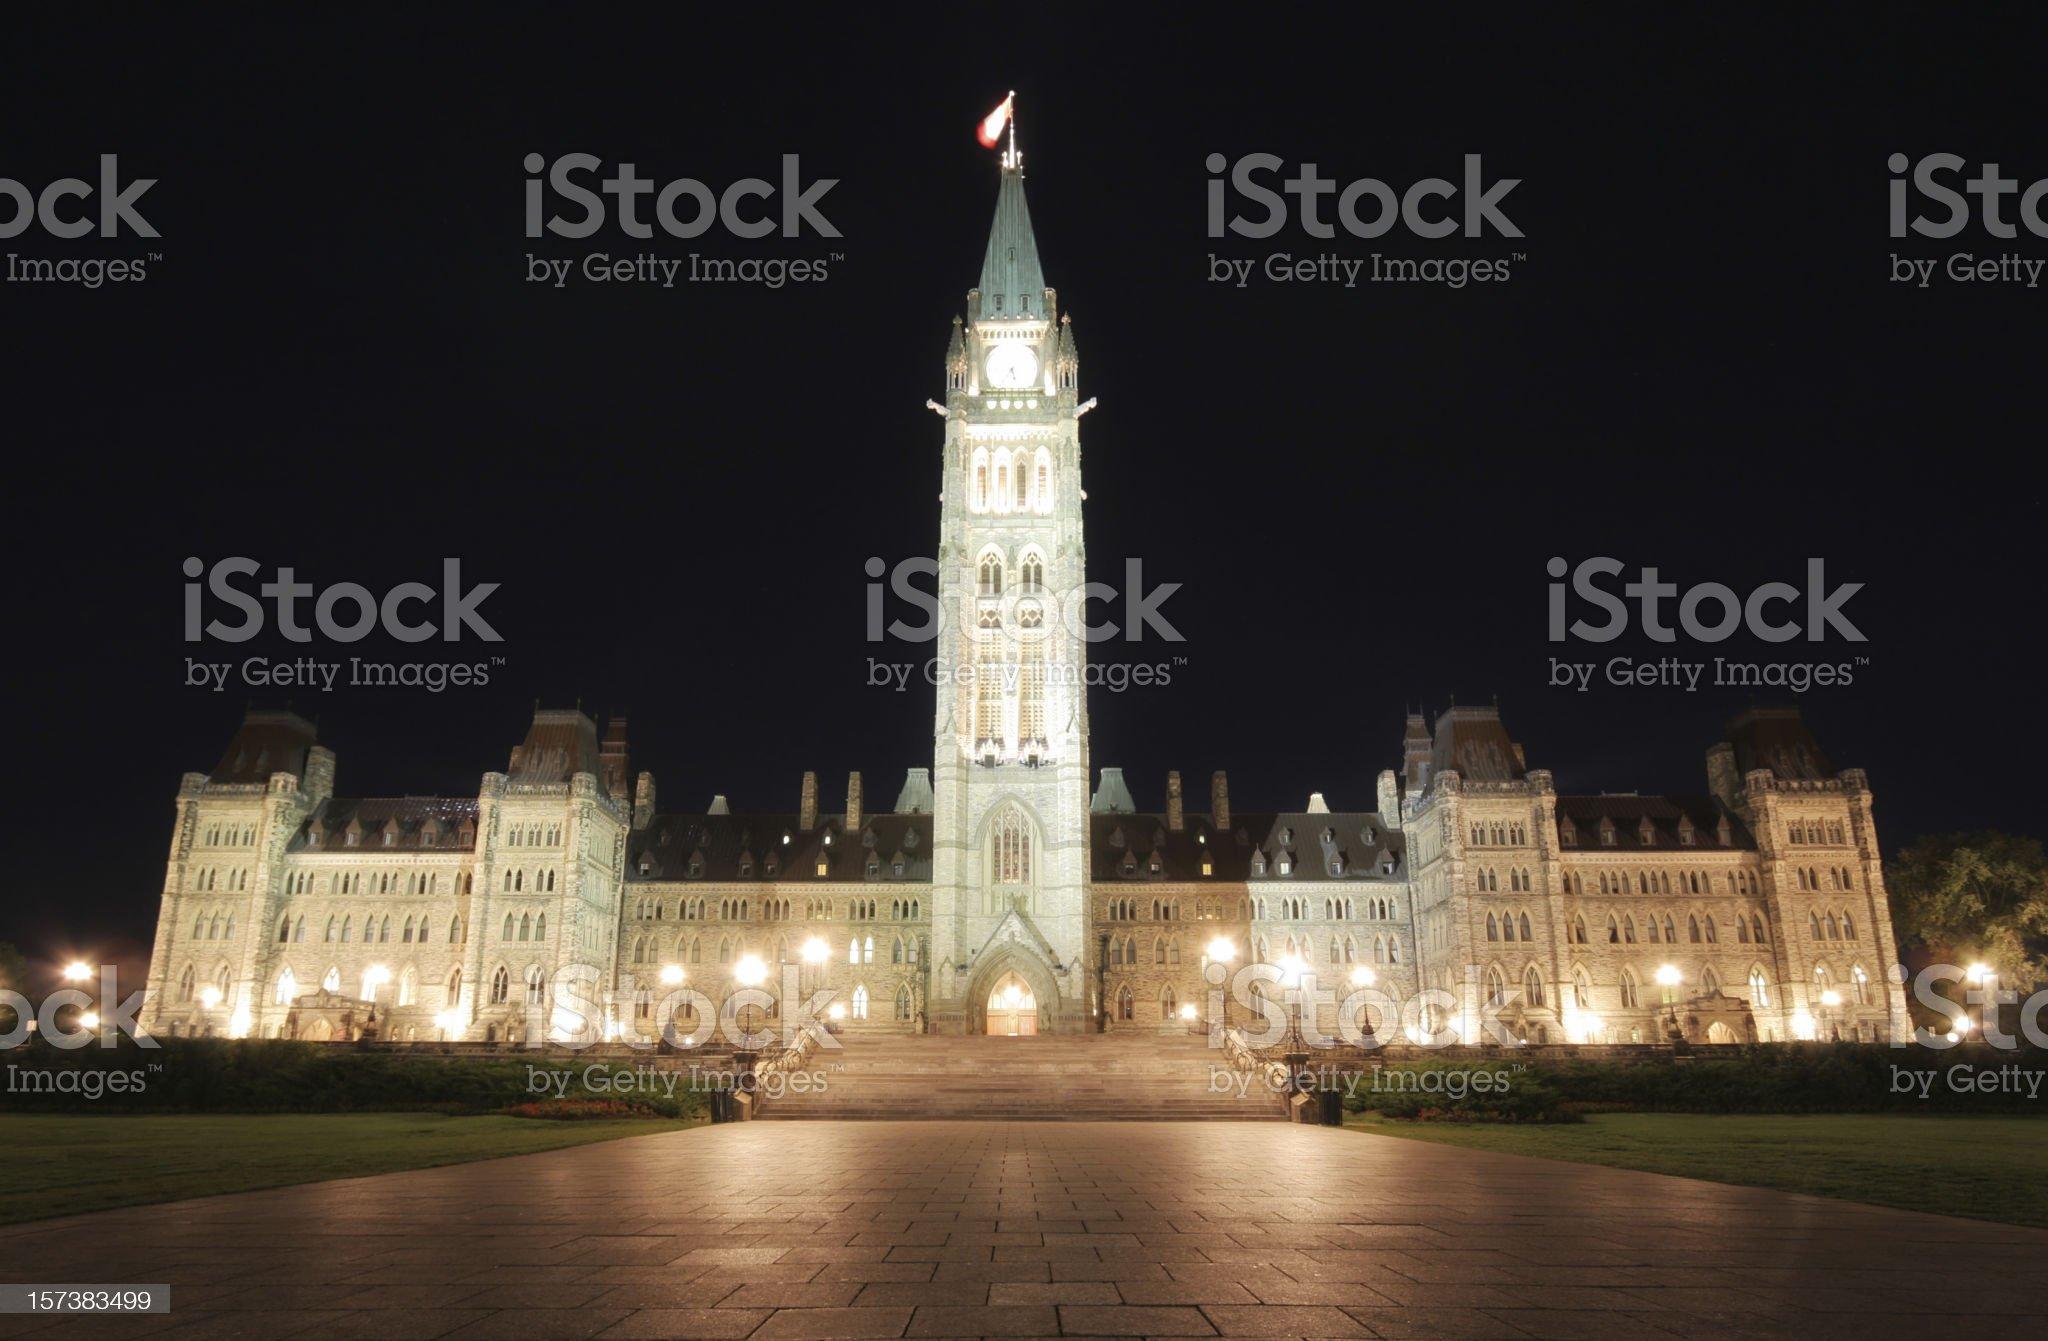 Illuminated Canadian Parliament Building at Night royalty-free stock photo